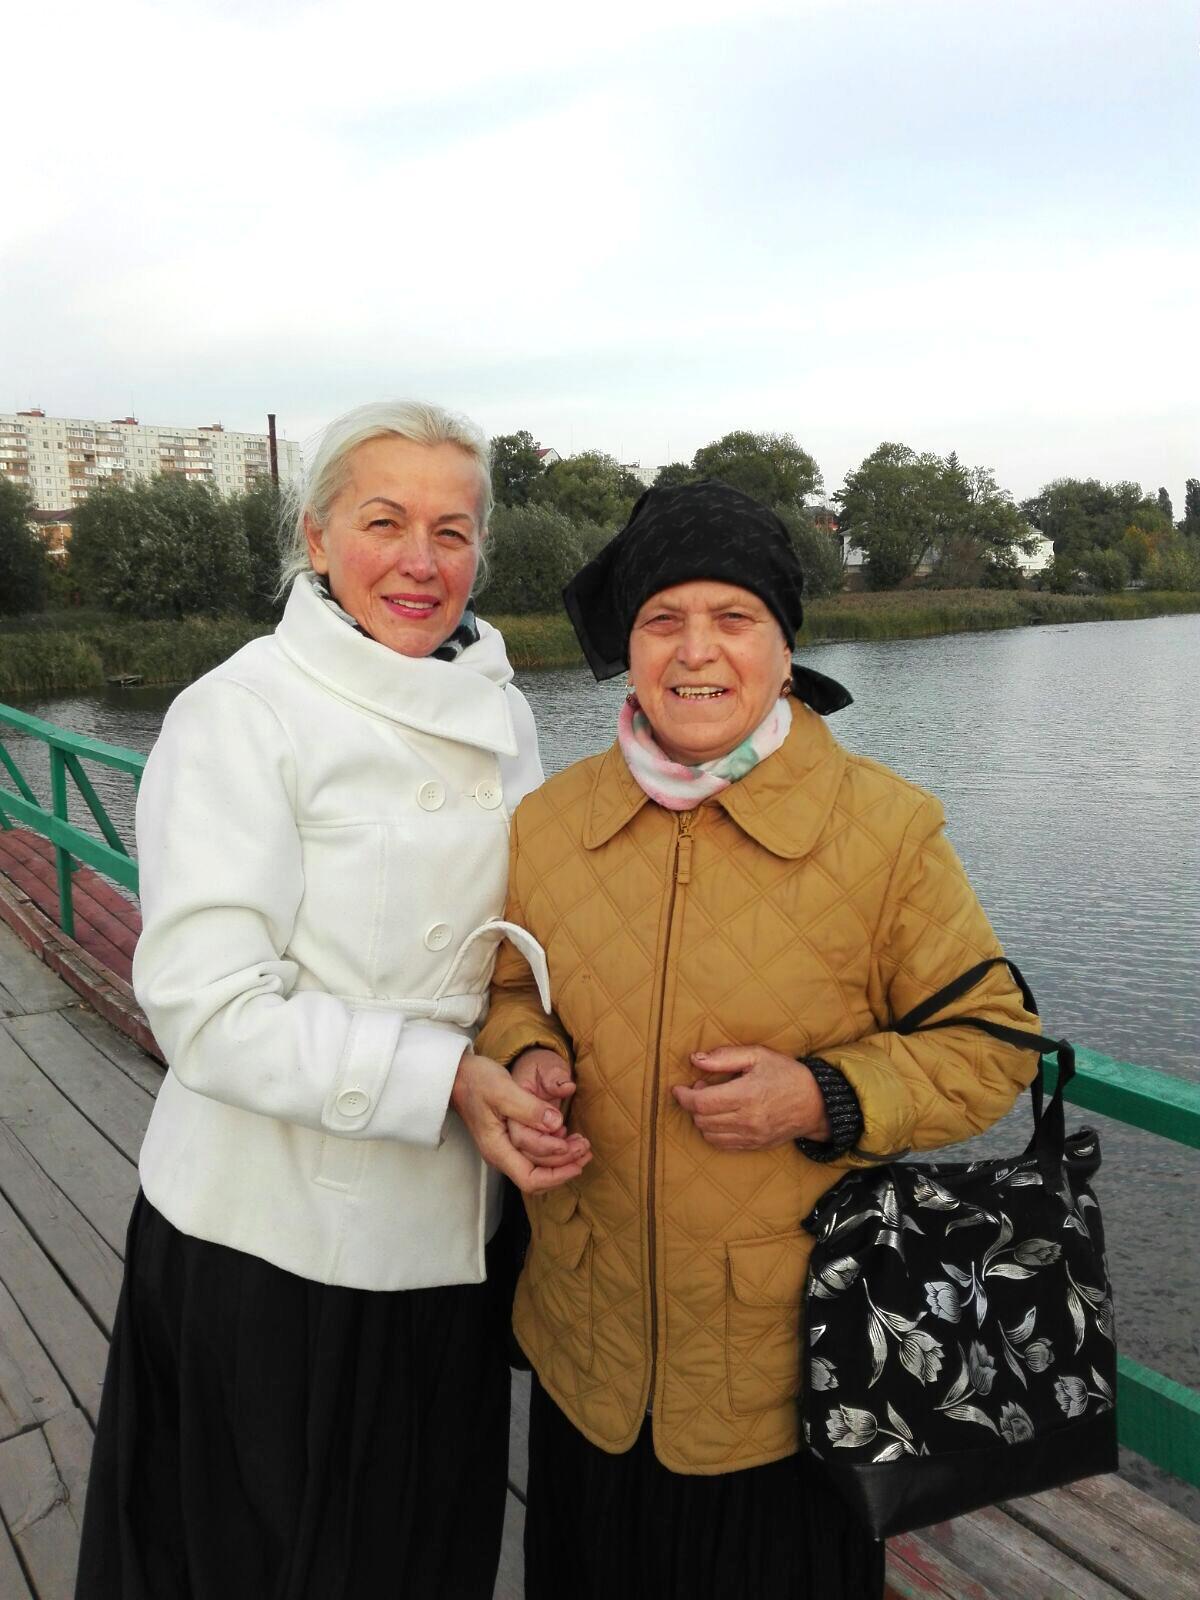 Сестри Козулін Катерина Миколаївна та Ольга Миколаївна